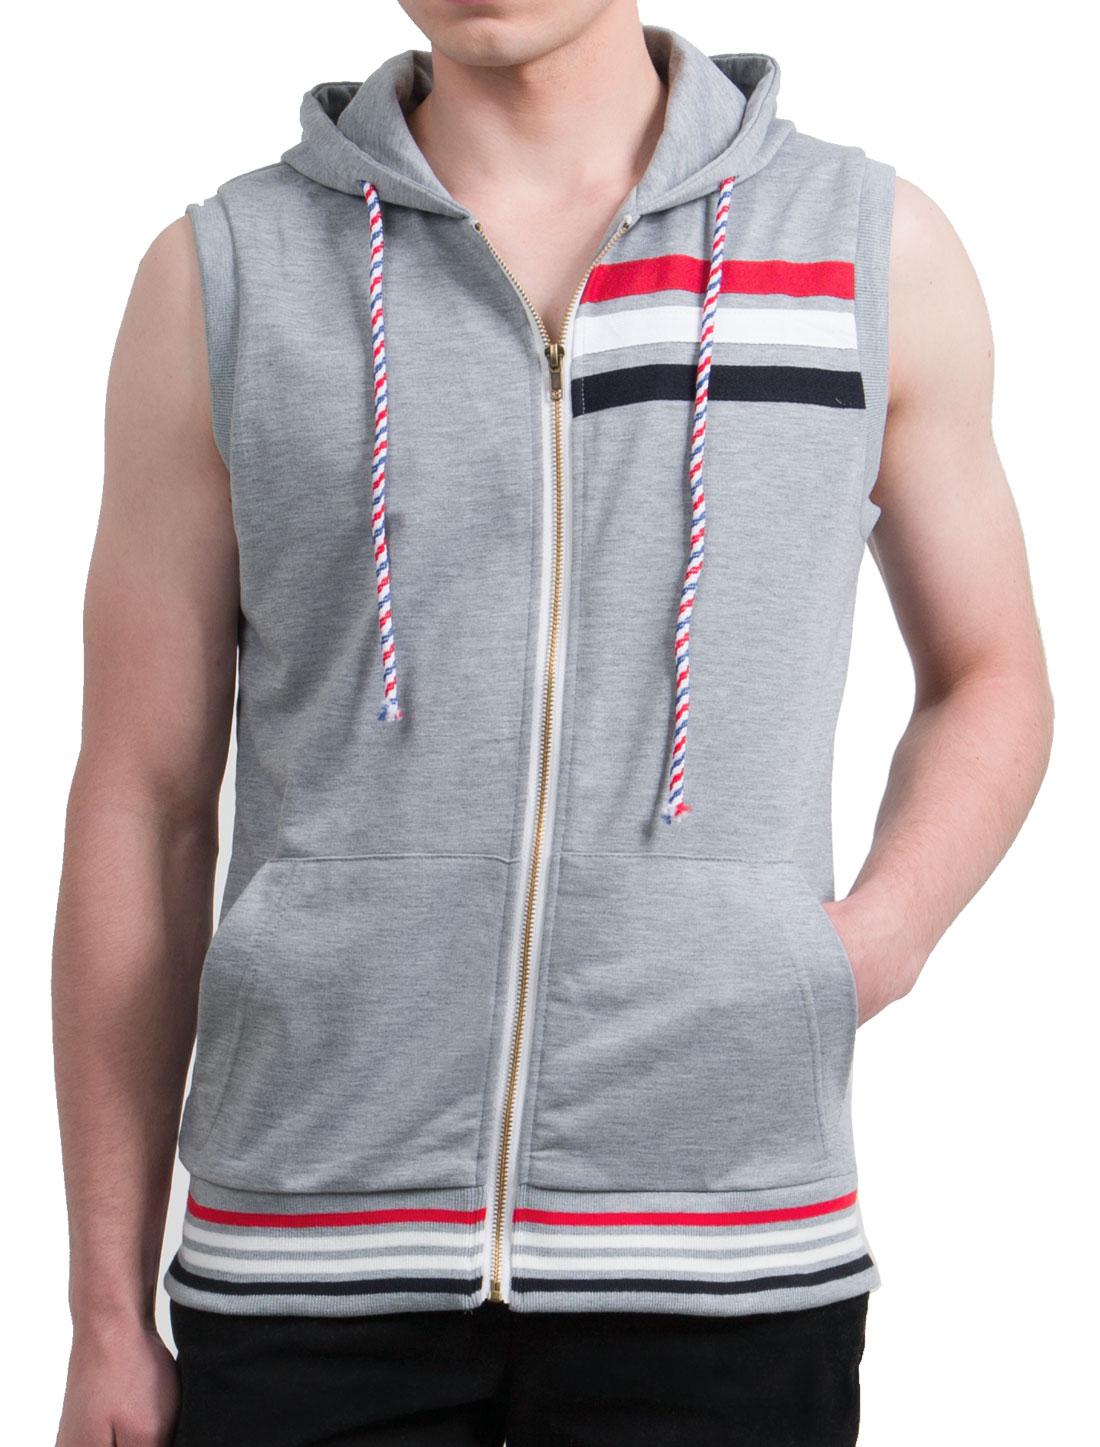 Men Front Zip Contrast Stripe Kangaroo Pockets Drawstring Hoodie Vest Light Gray M